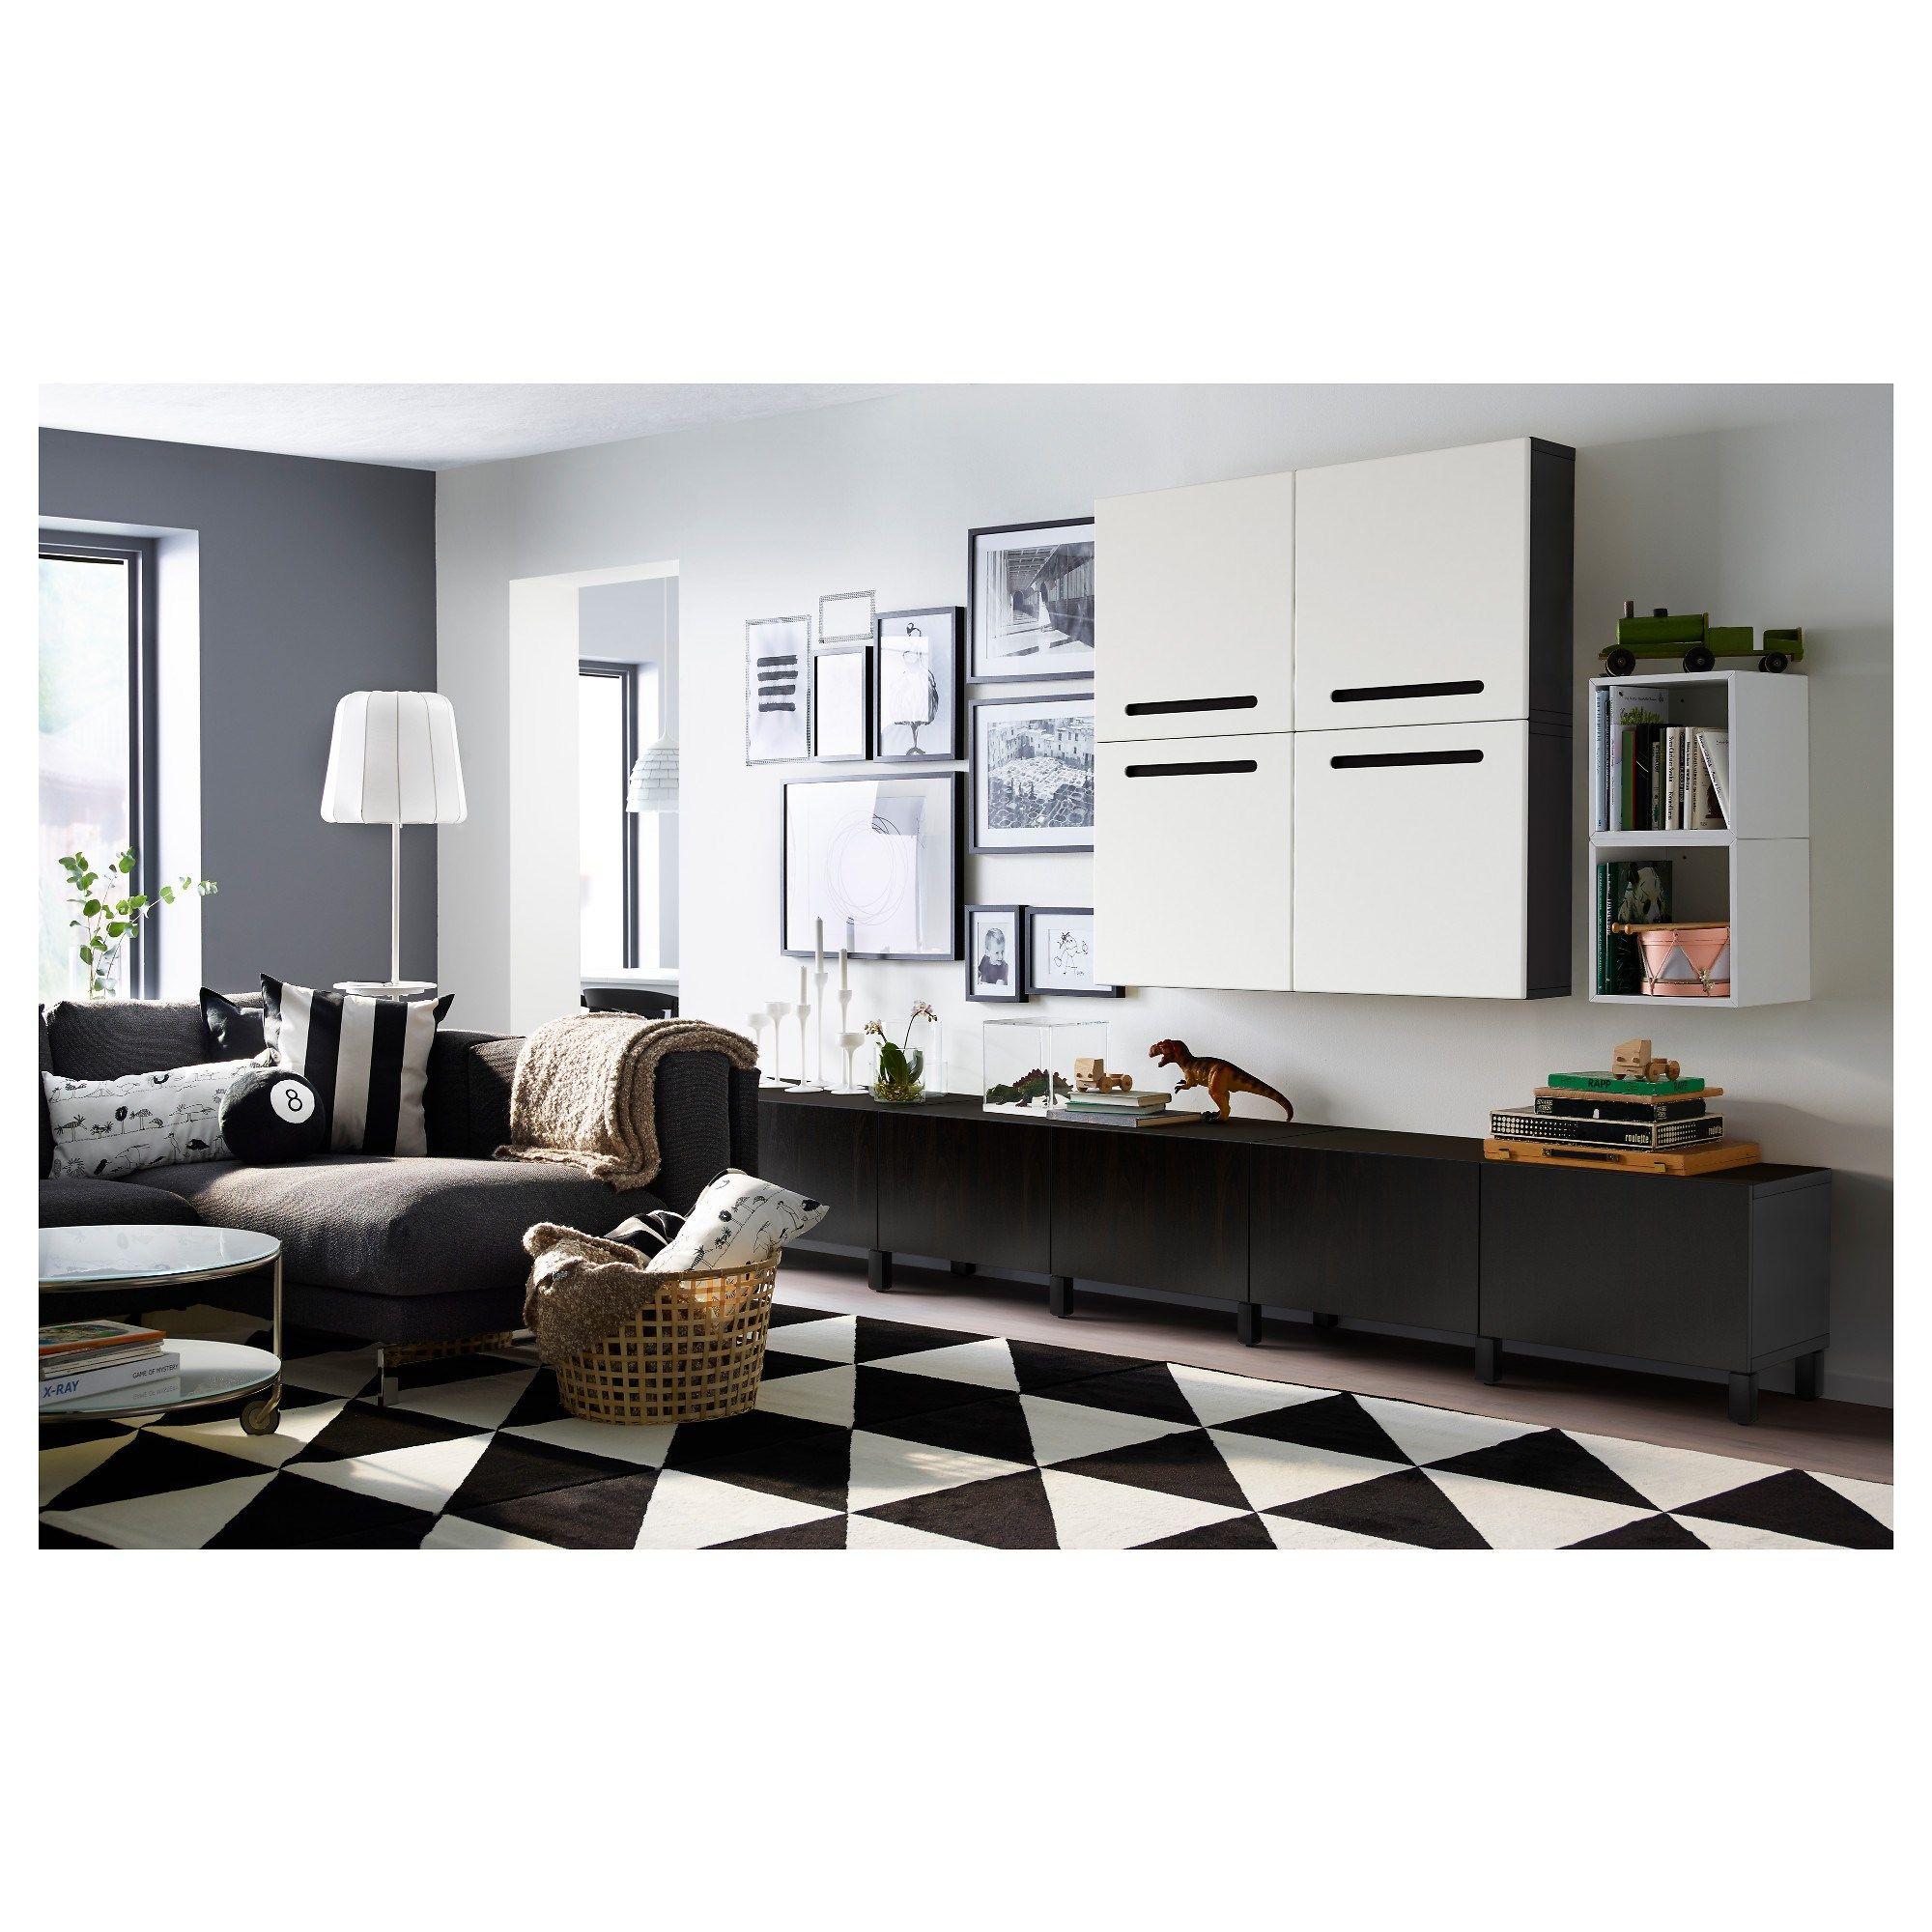 Ikea Living Room Storage Sillerup Hala Siyah Beyaz 200x300 Cm Ikea Ev Tekstili Deco